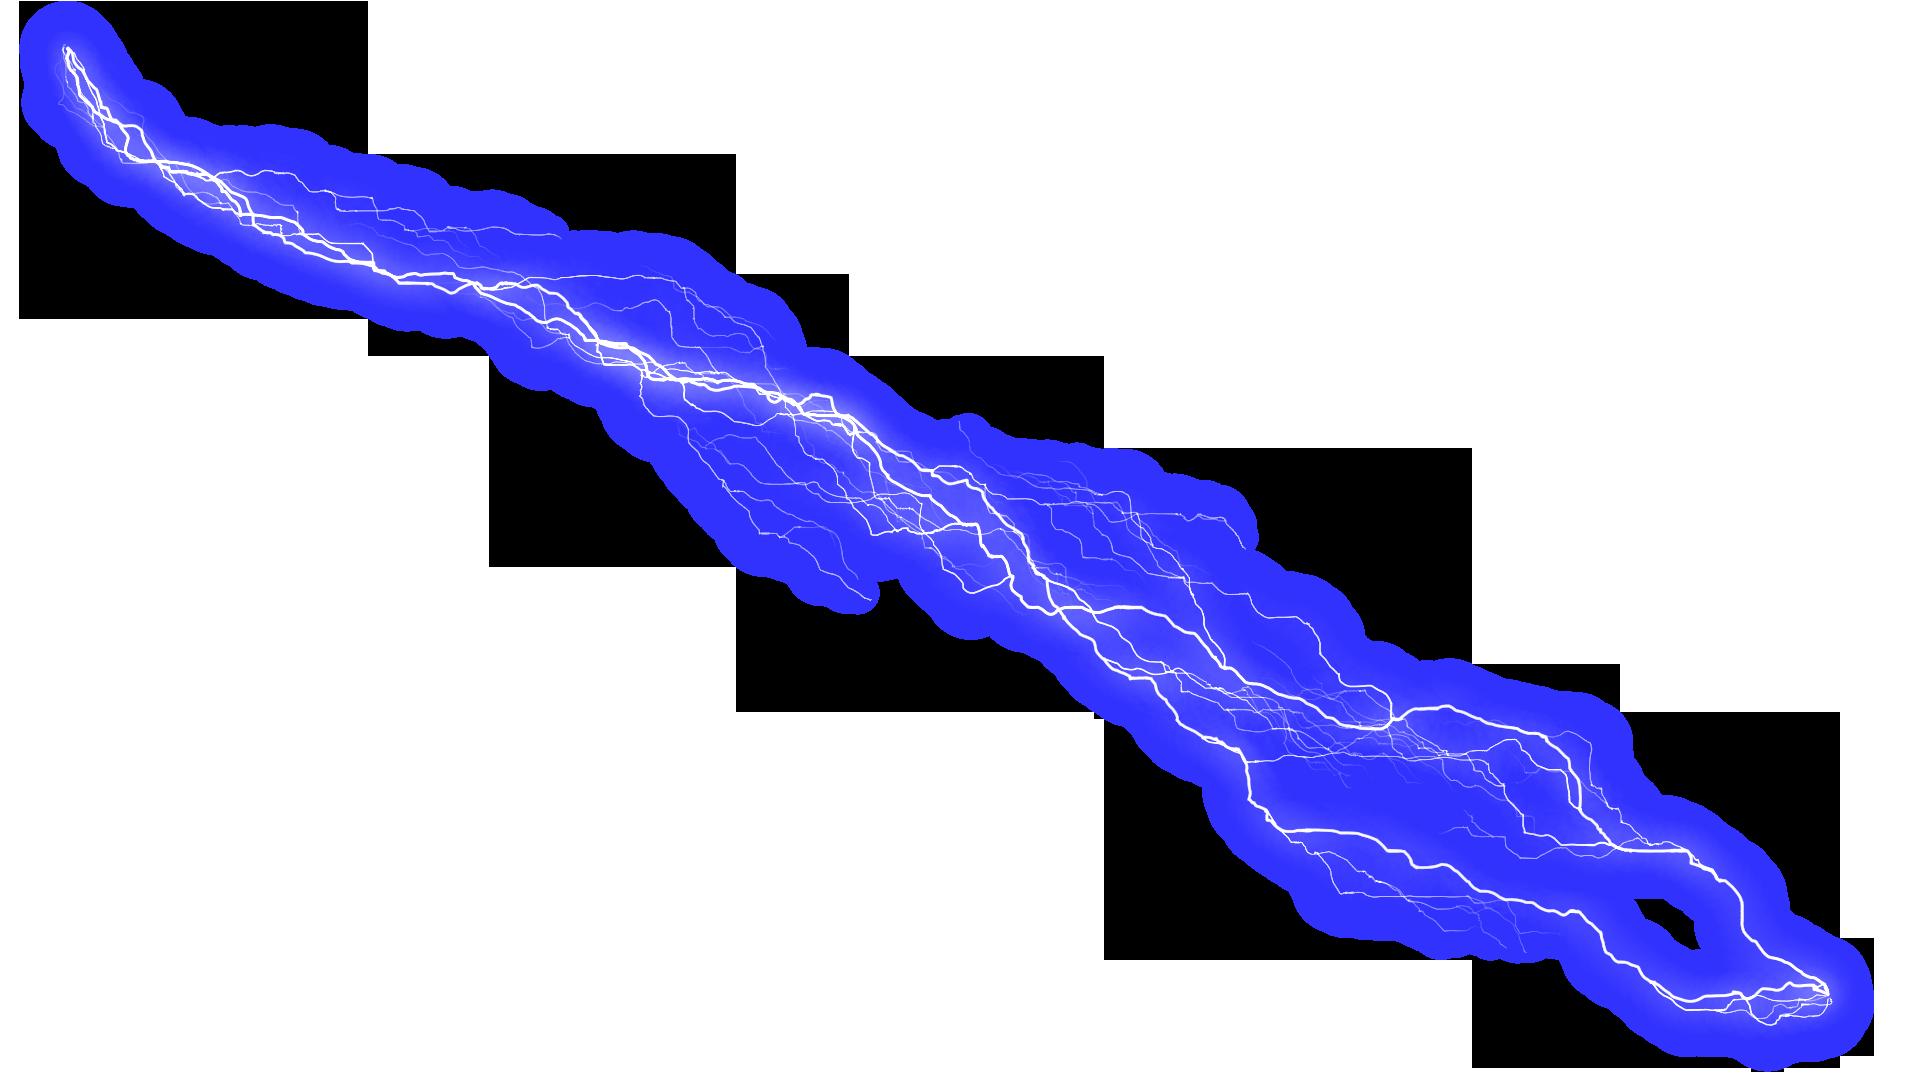 Lighting clipart real lightning. Thunder clip art transparent